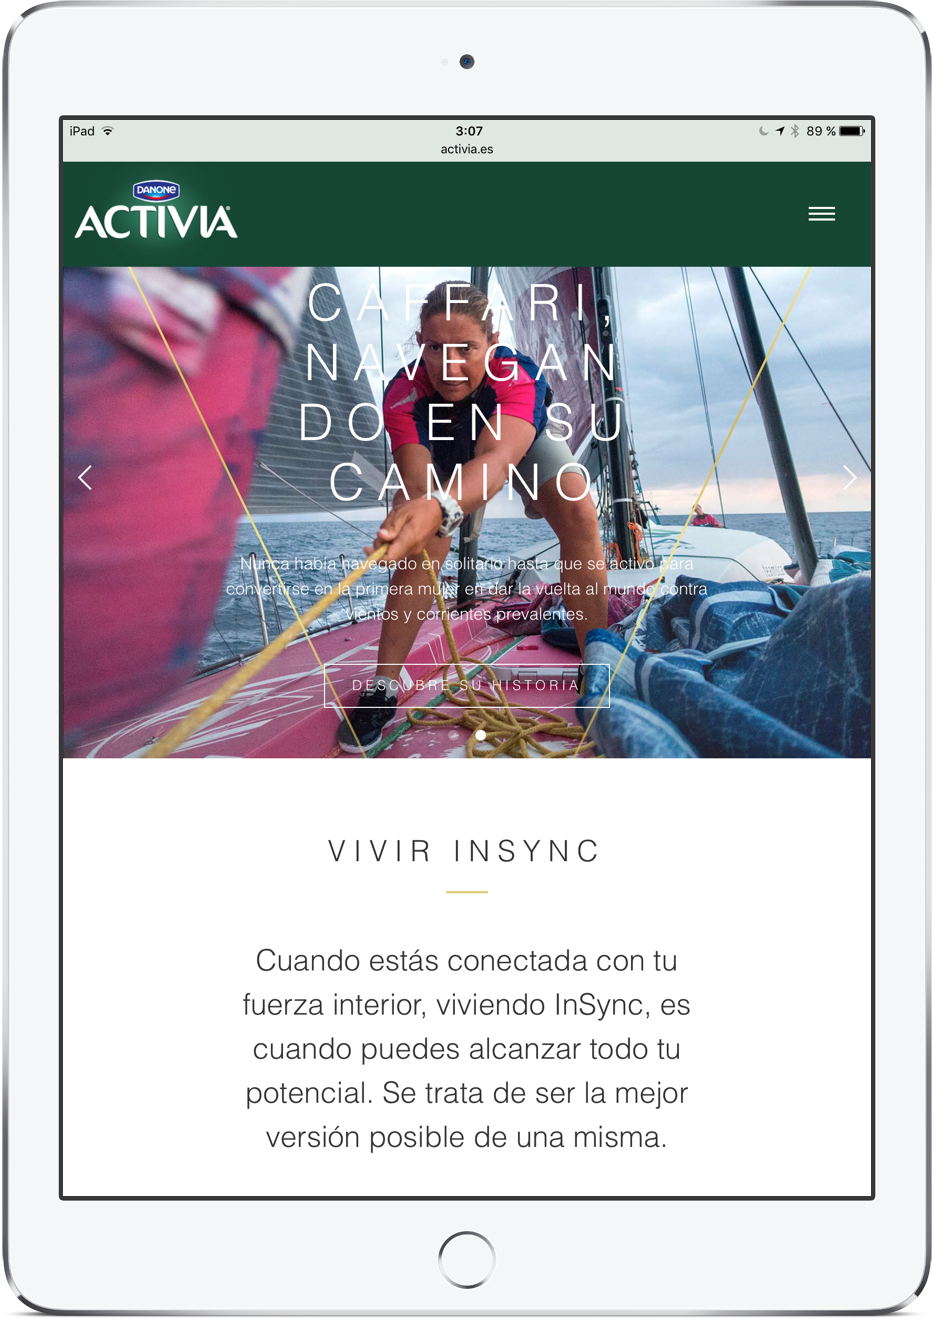 Activia website español